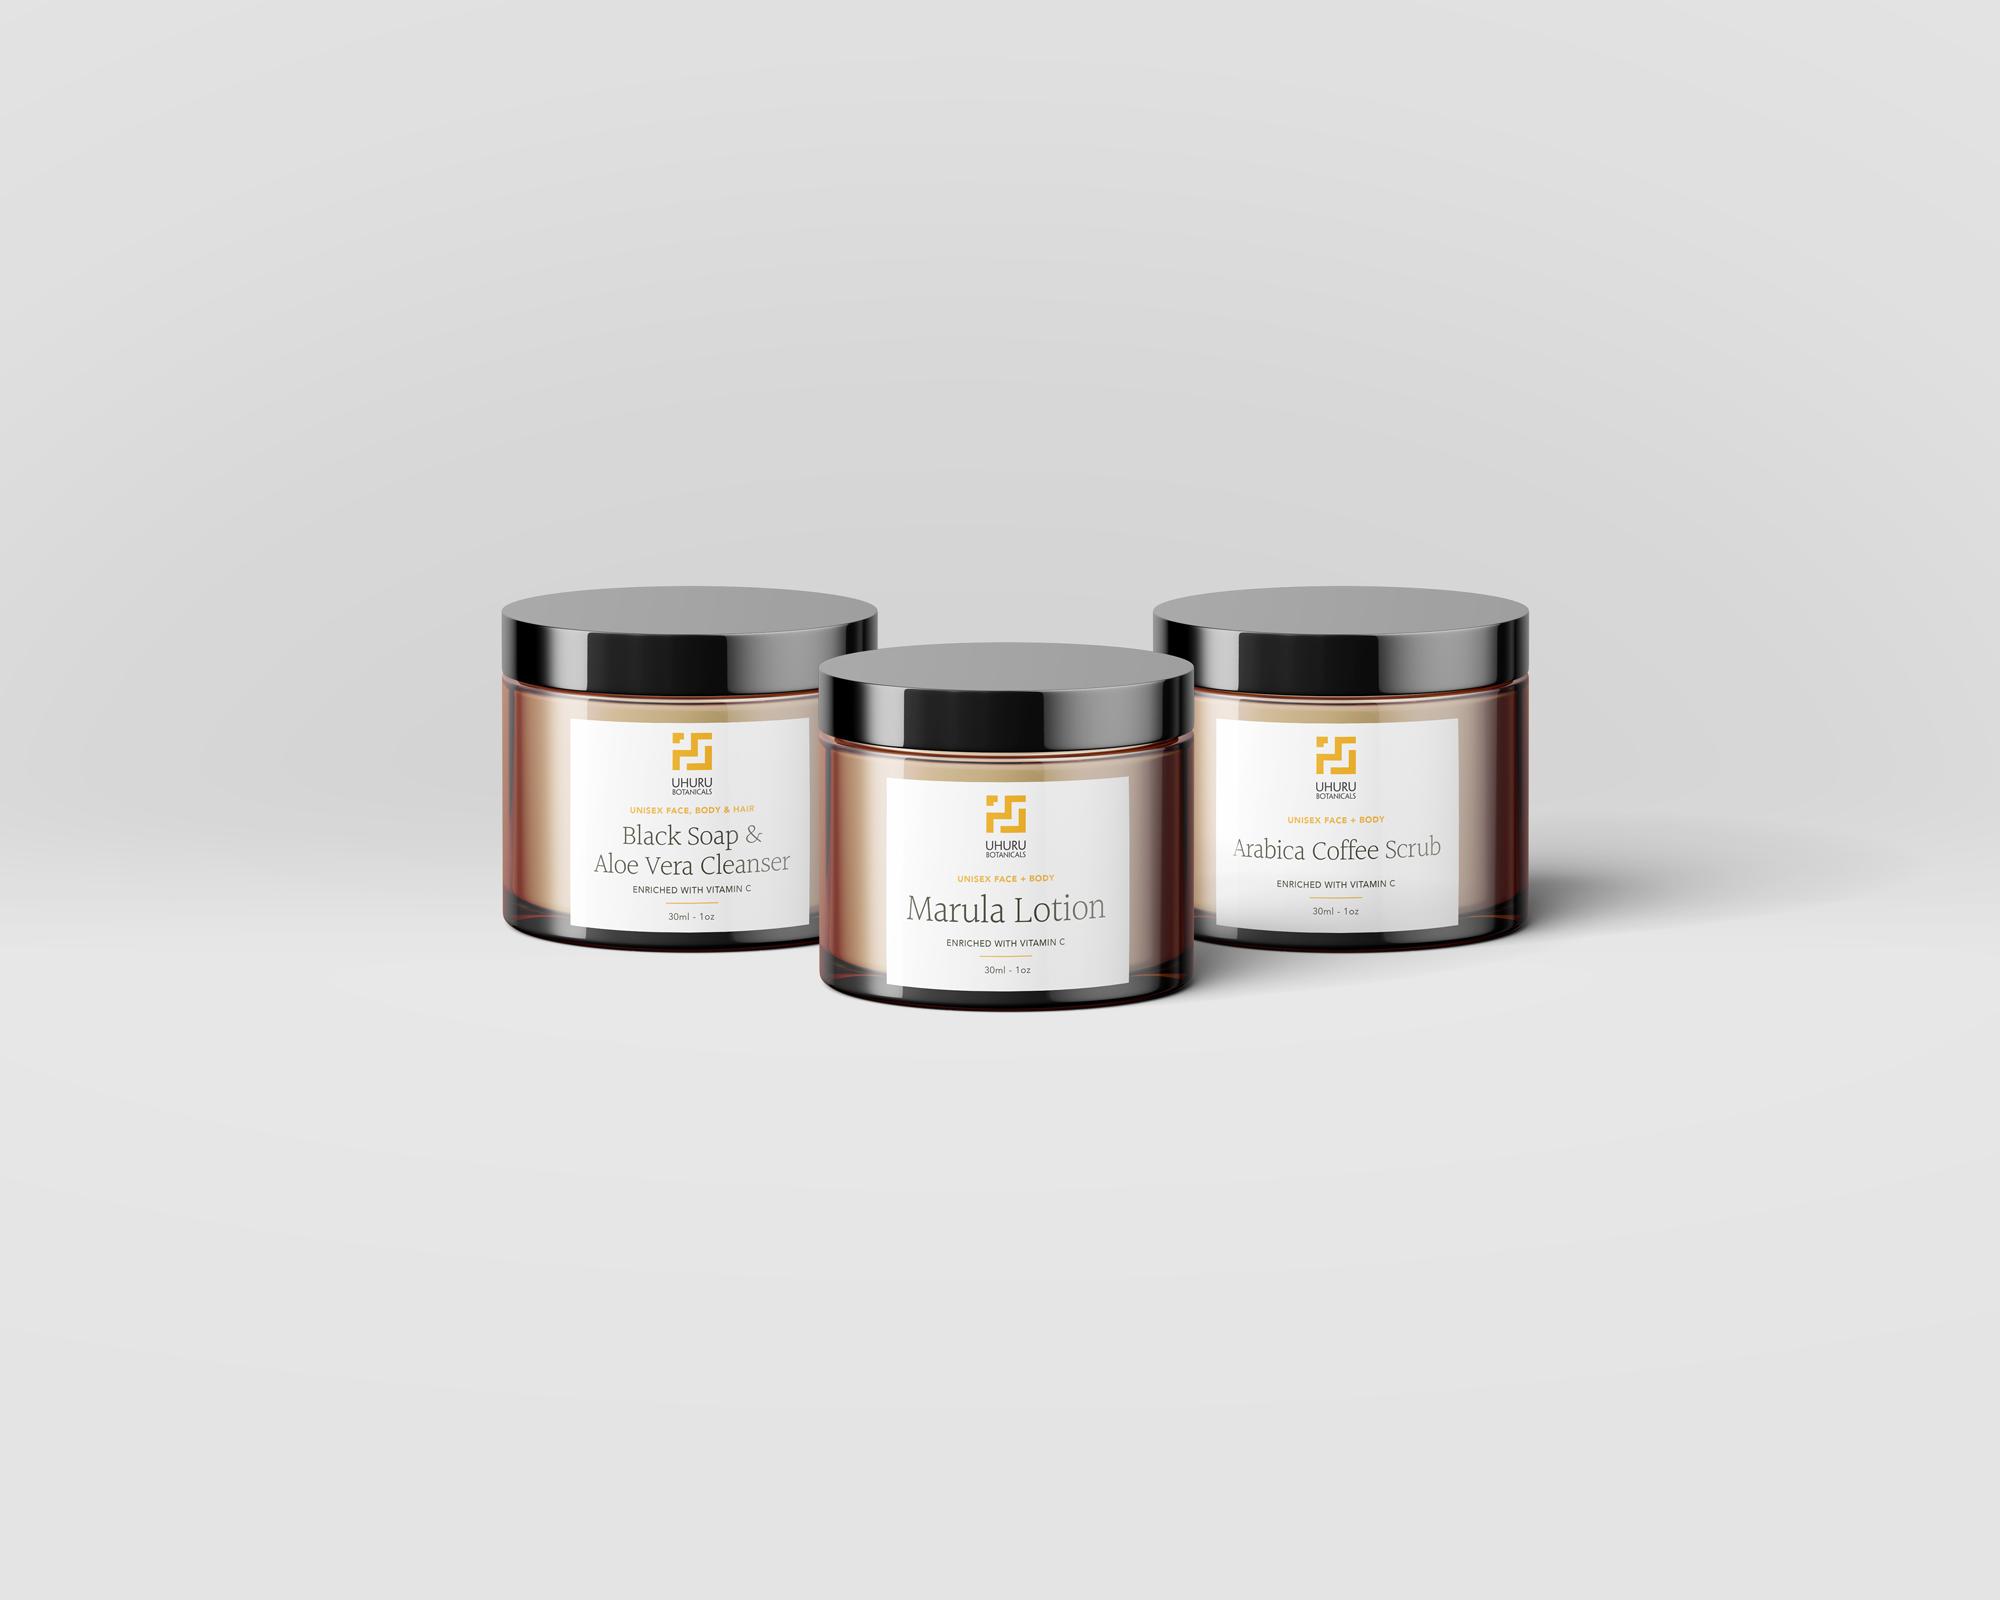 uhuru-botanicals-label-packaging-design-minis-studio-77-london.jpg